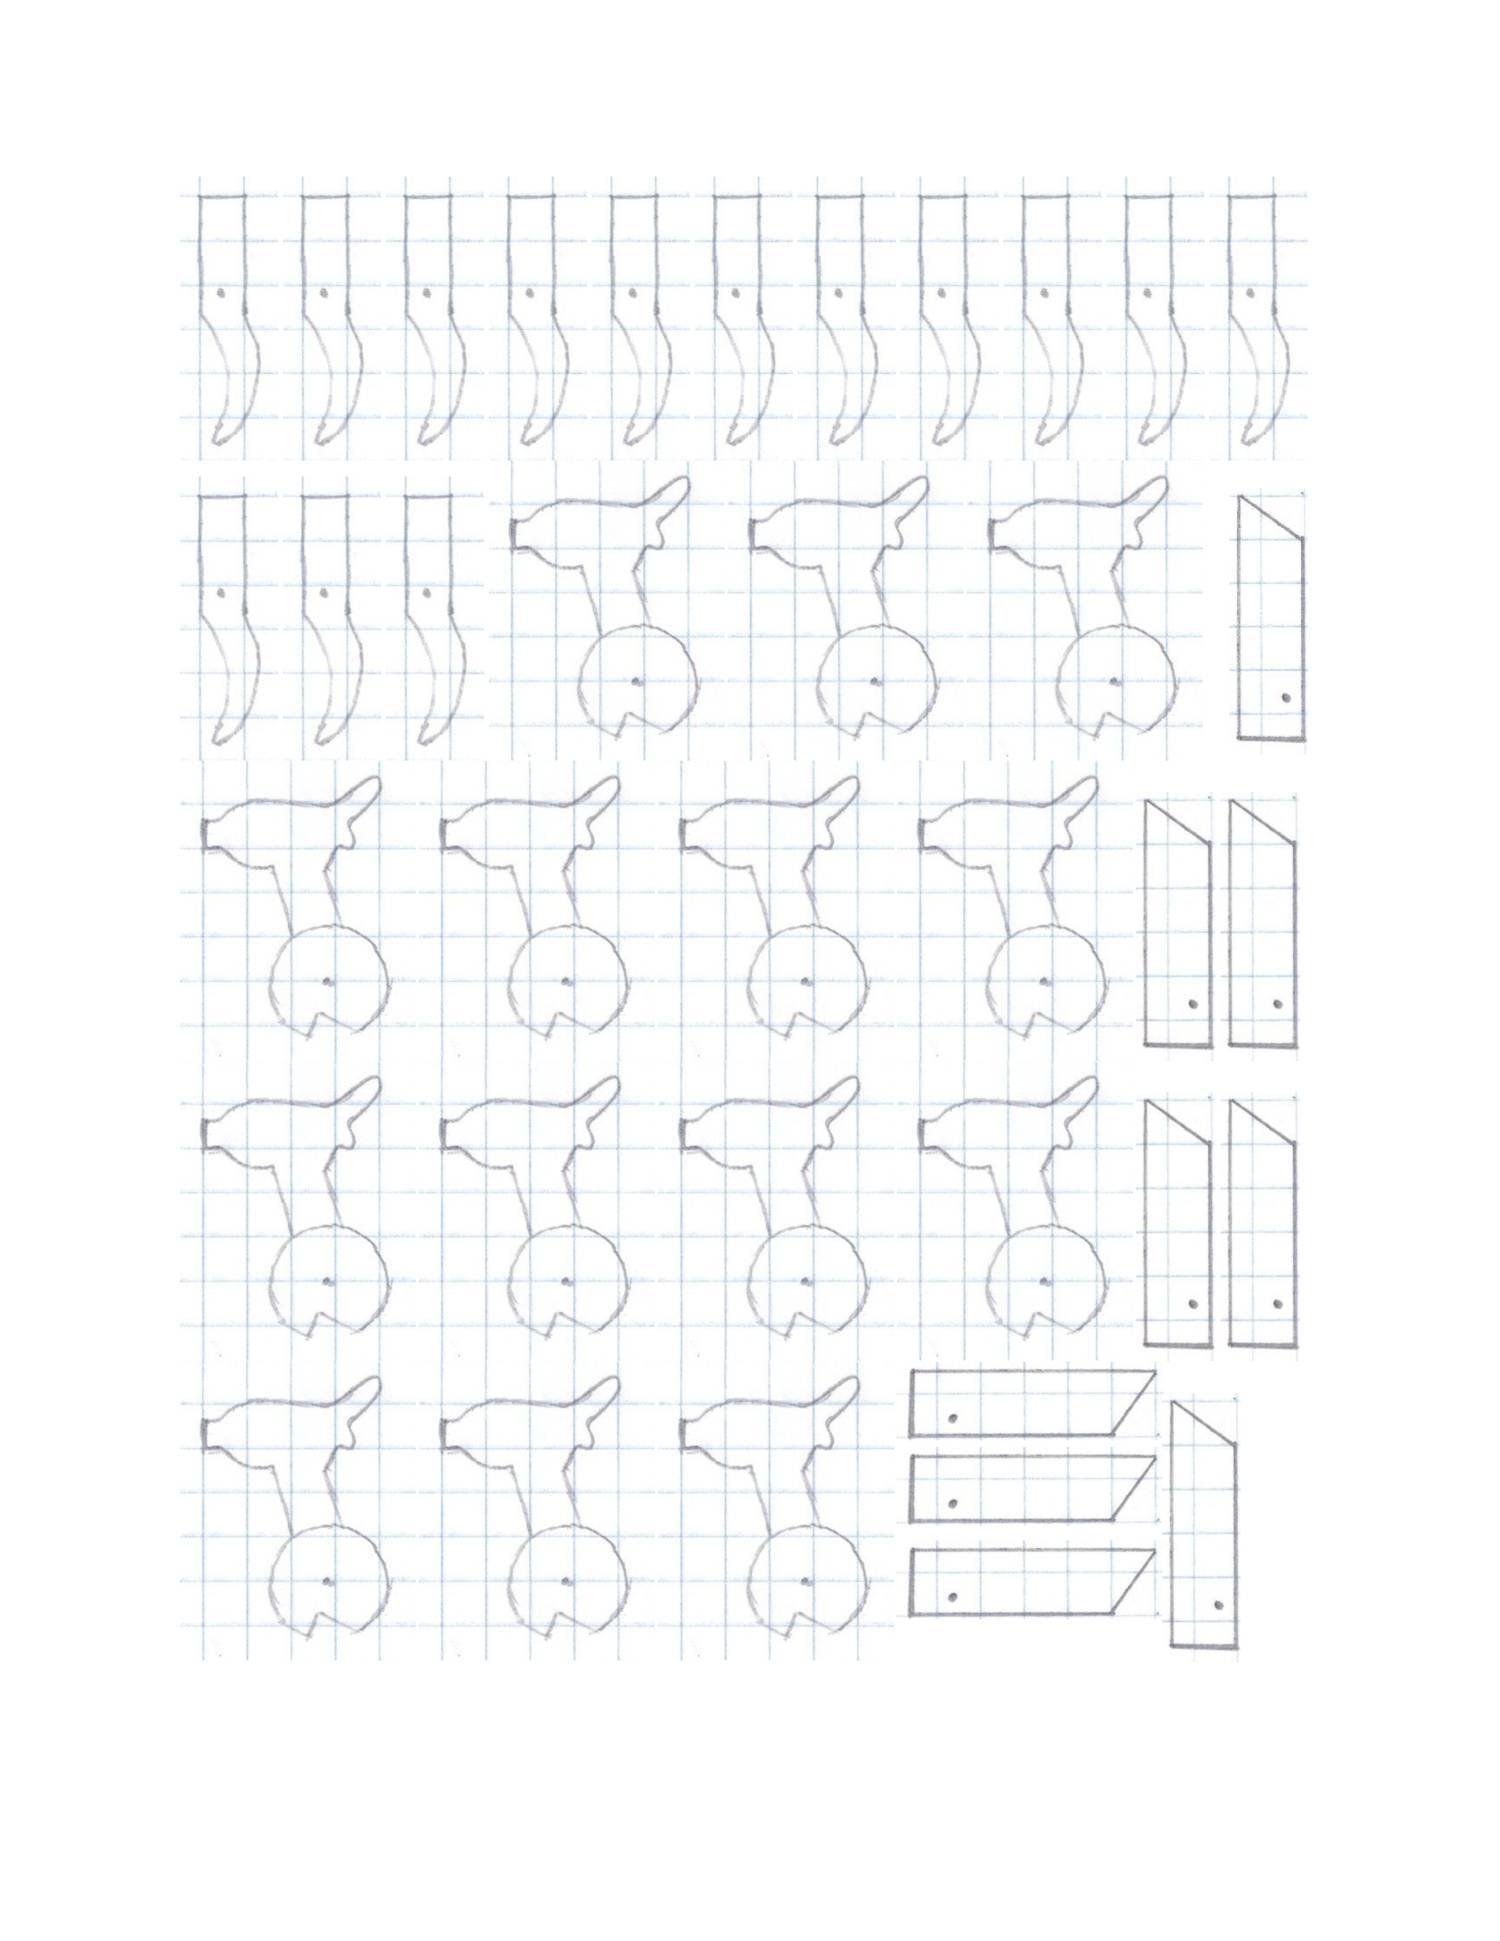 mini paper gun printoutspdf docdroid - Picture Printouts